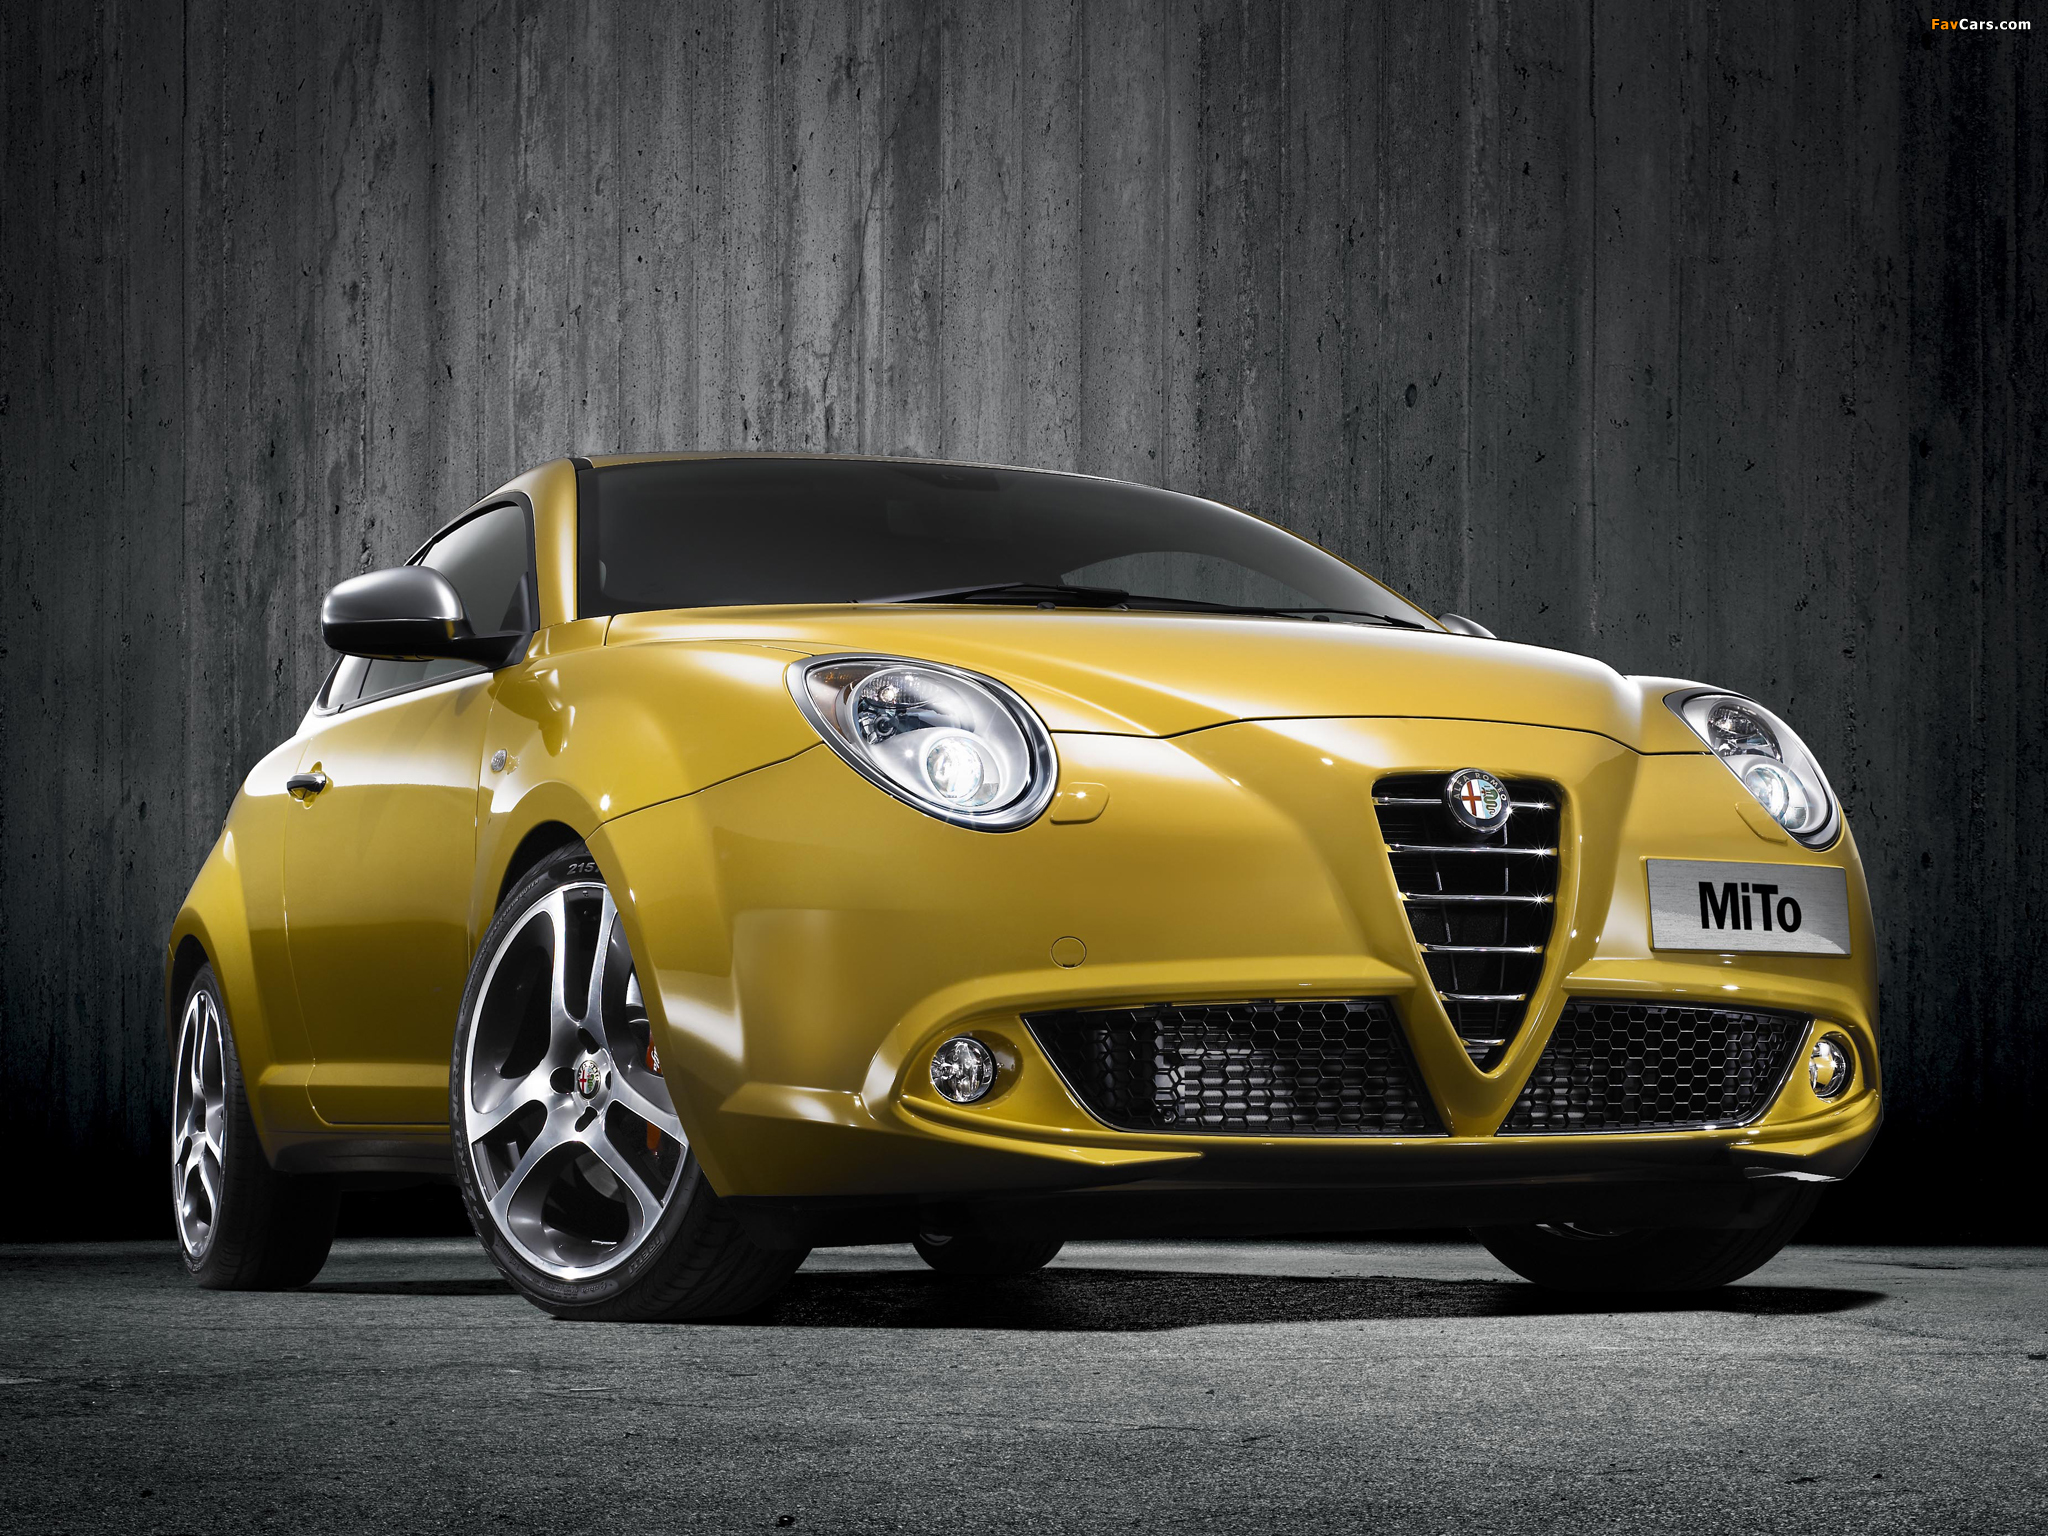 Alfa Romeo MiTo Imola 955 (2009) wallpapers (2048 x 1536)